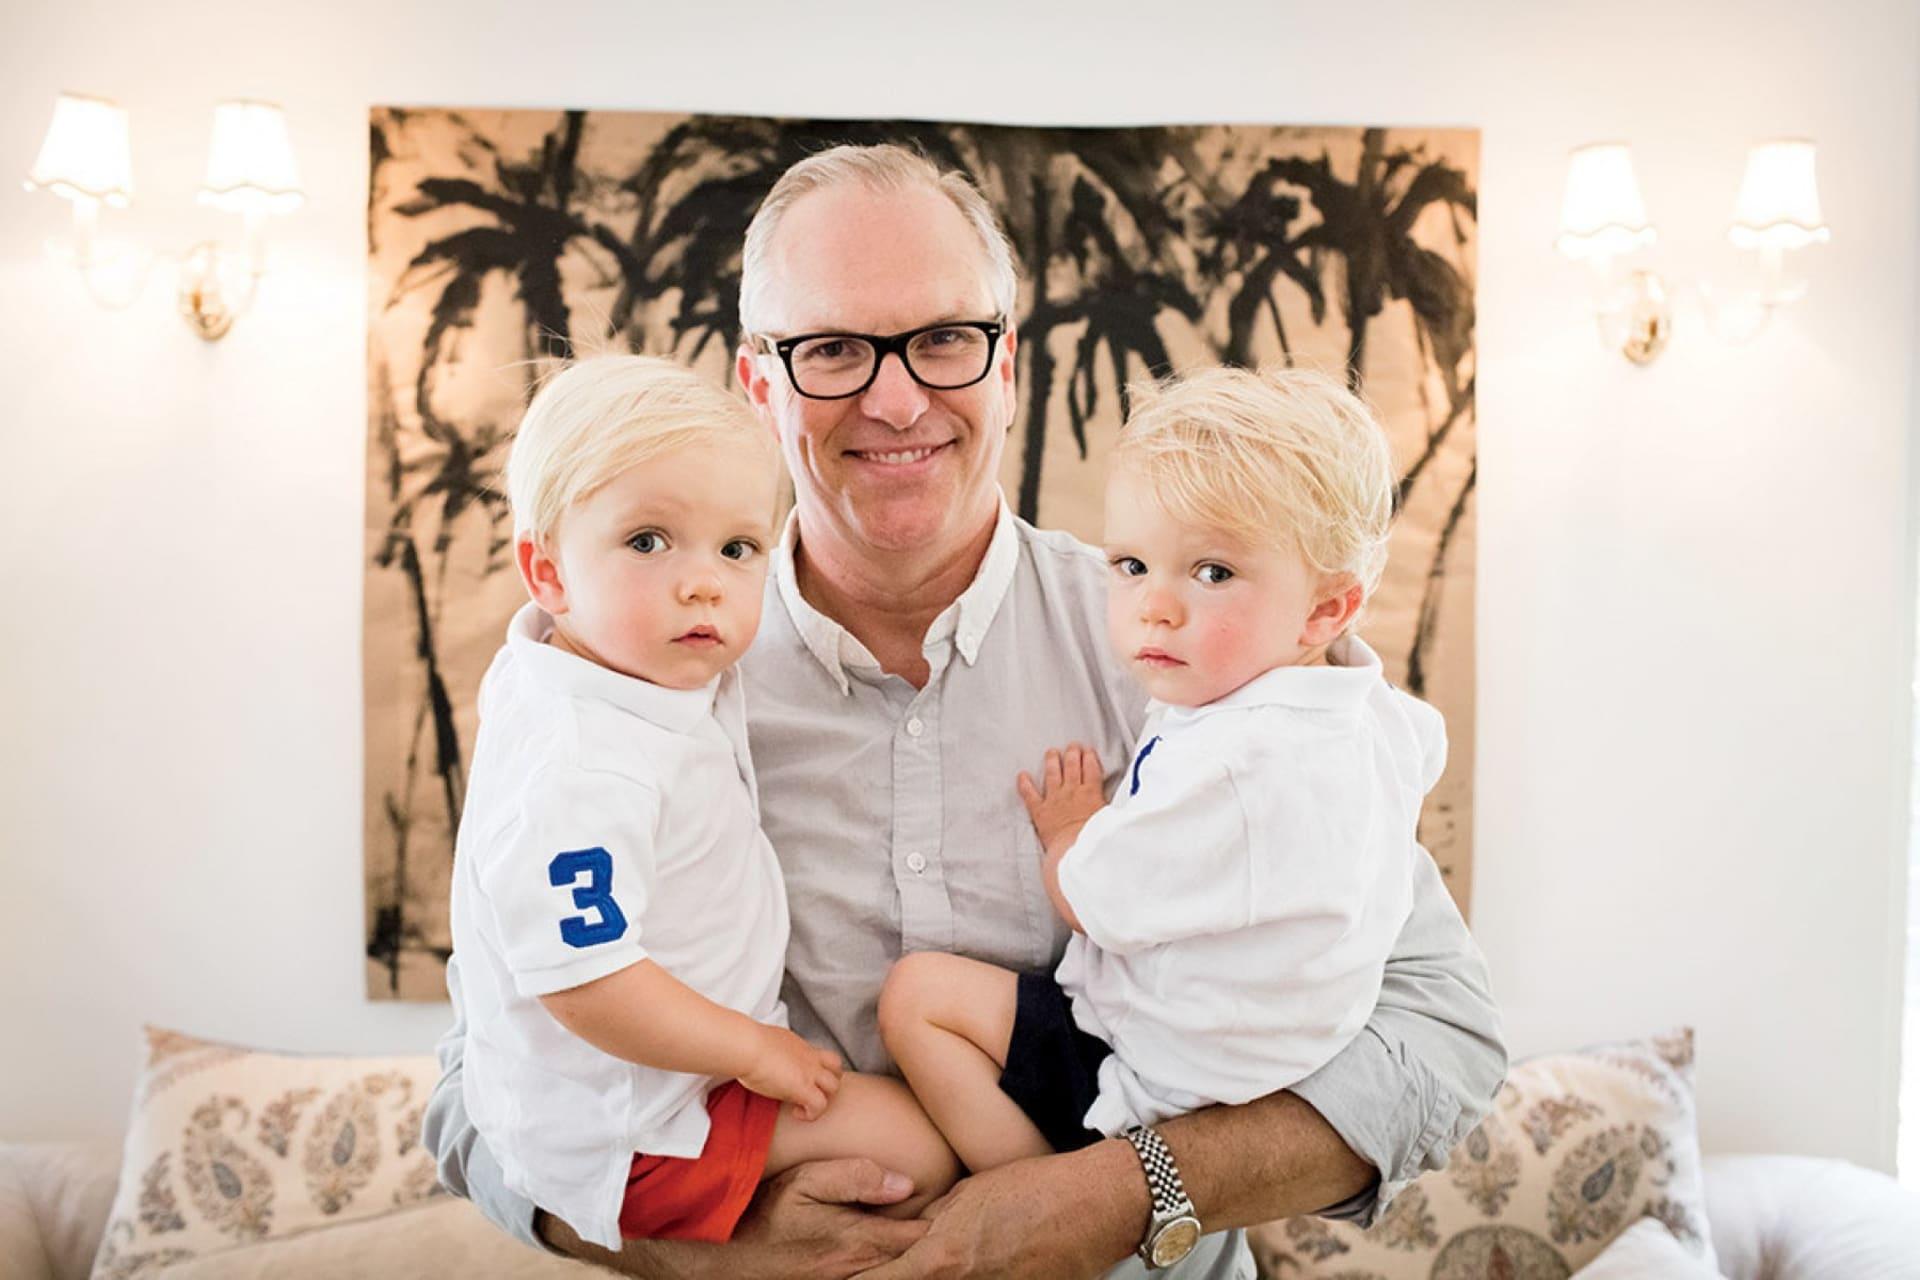 Donald robertson studio private lives ss11